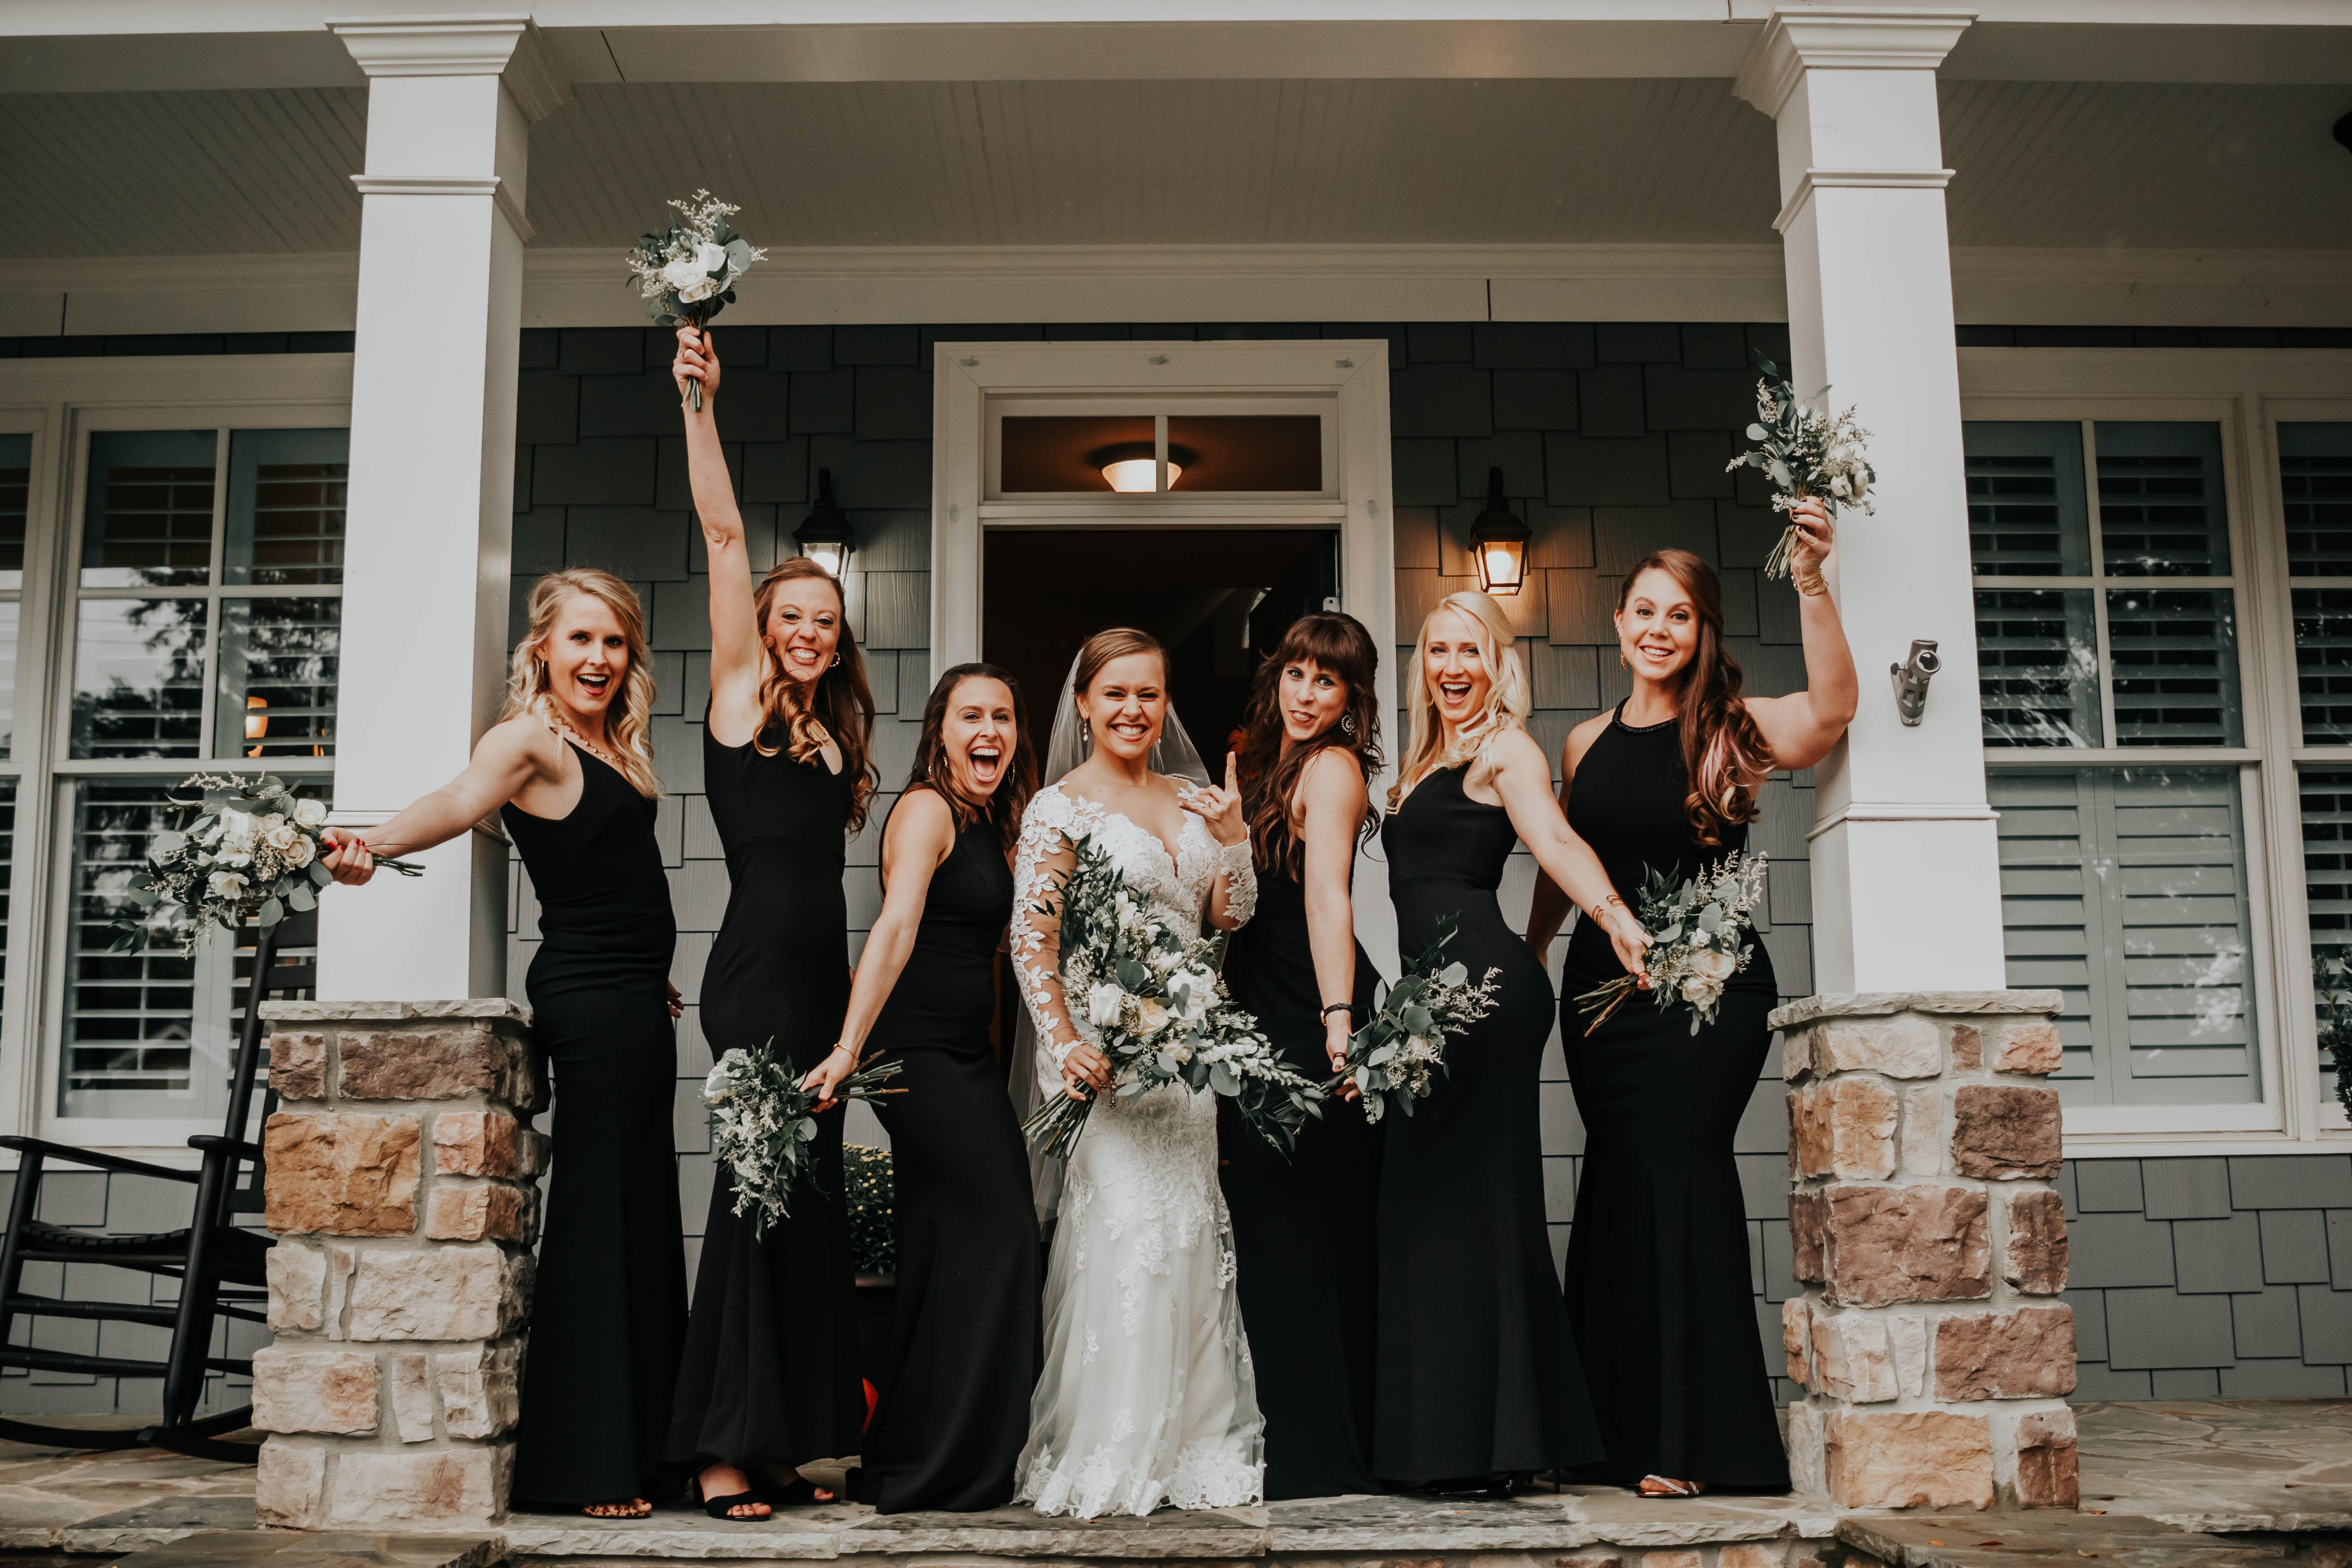 phillipsbride+bridesmaids(88of90)